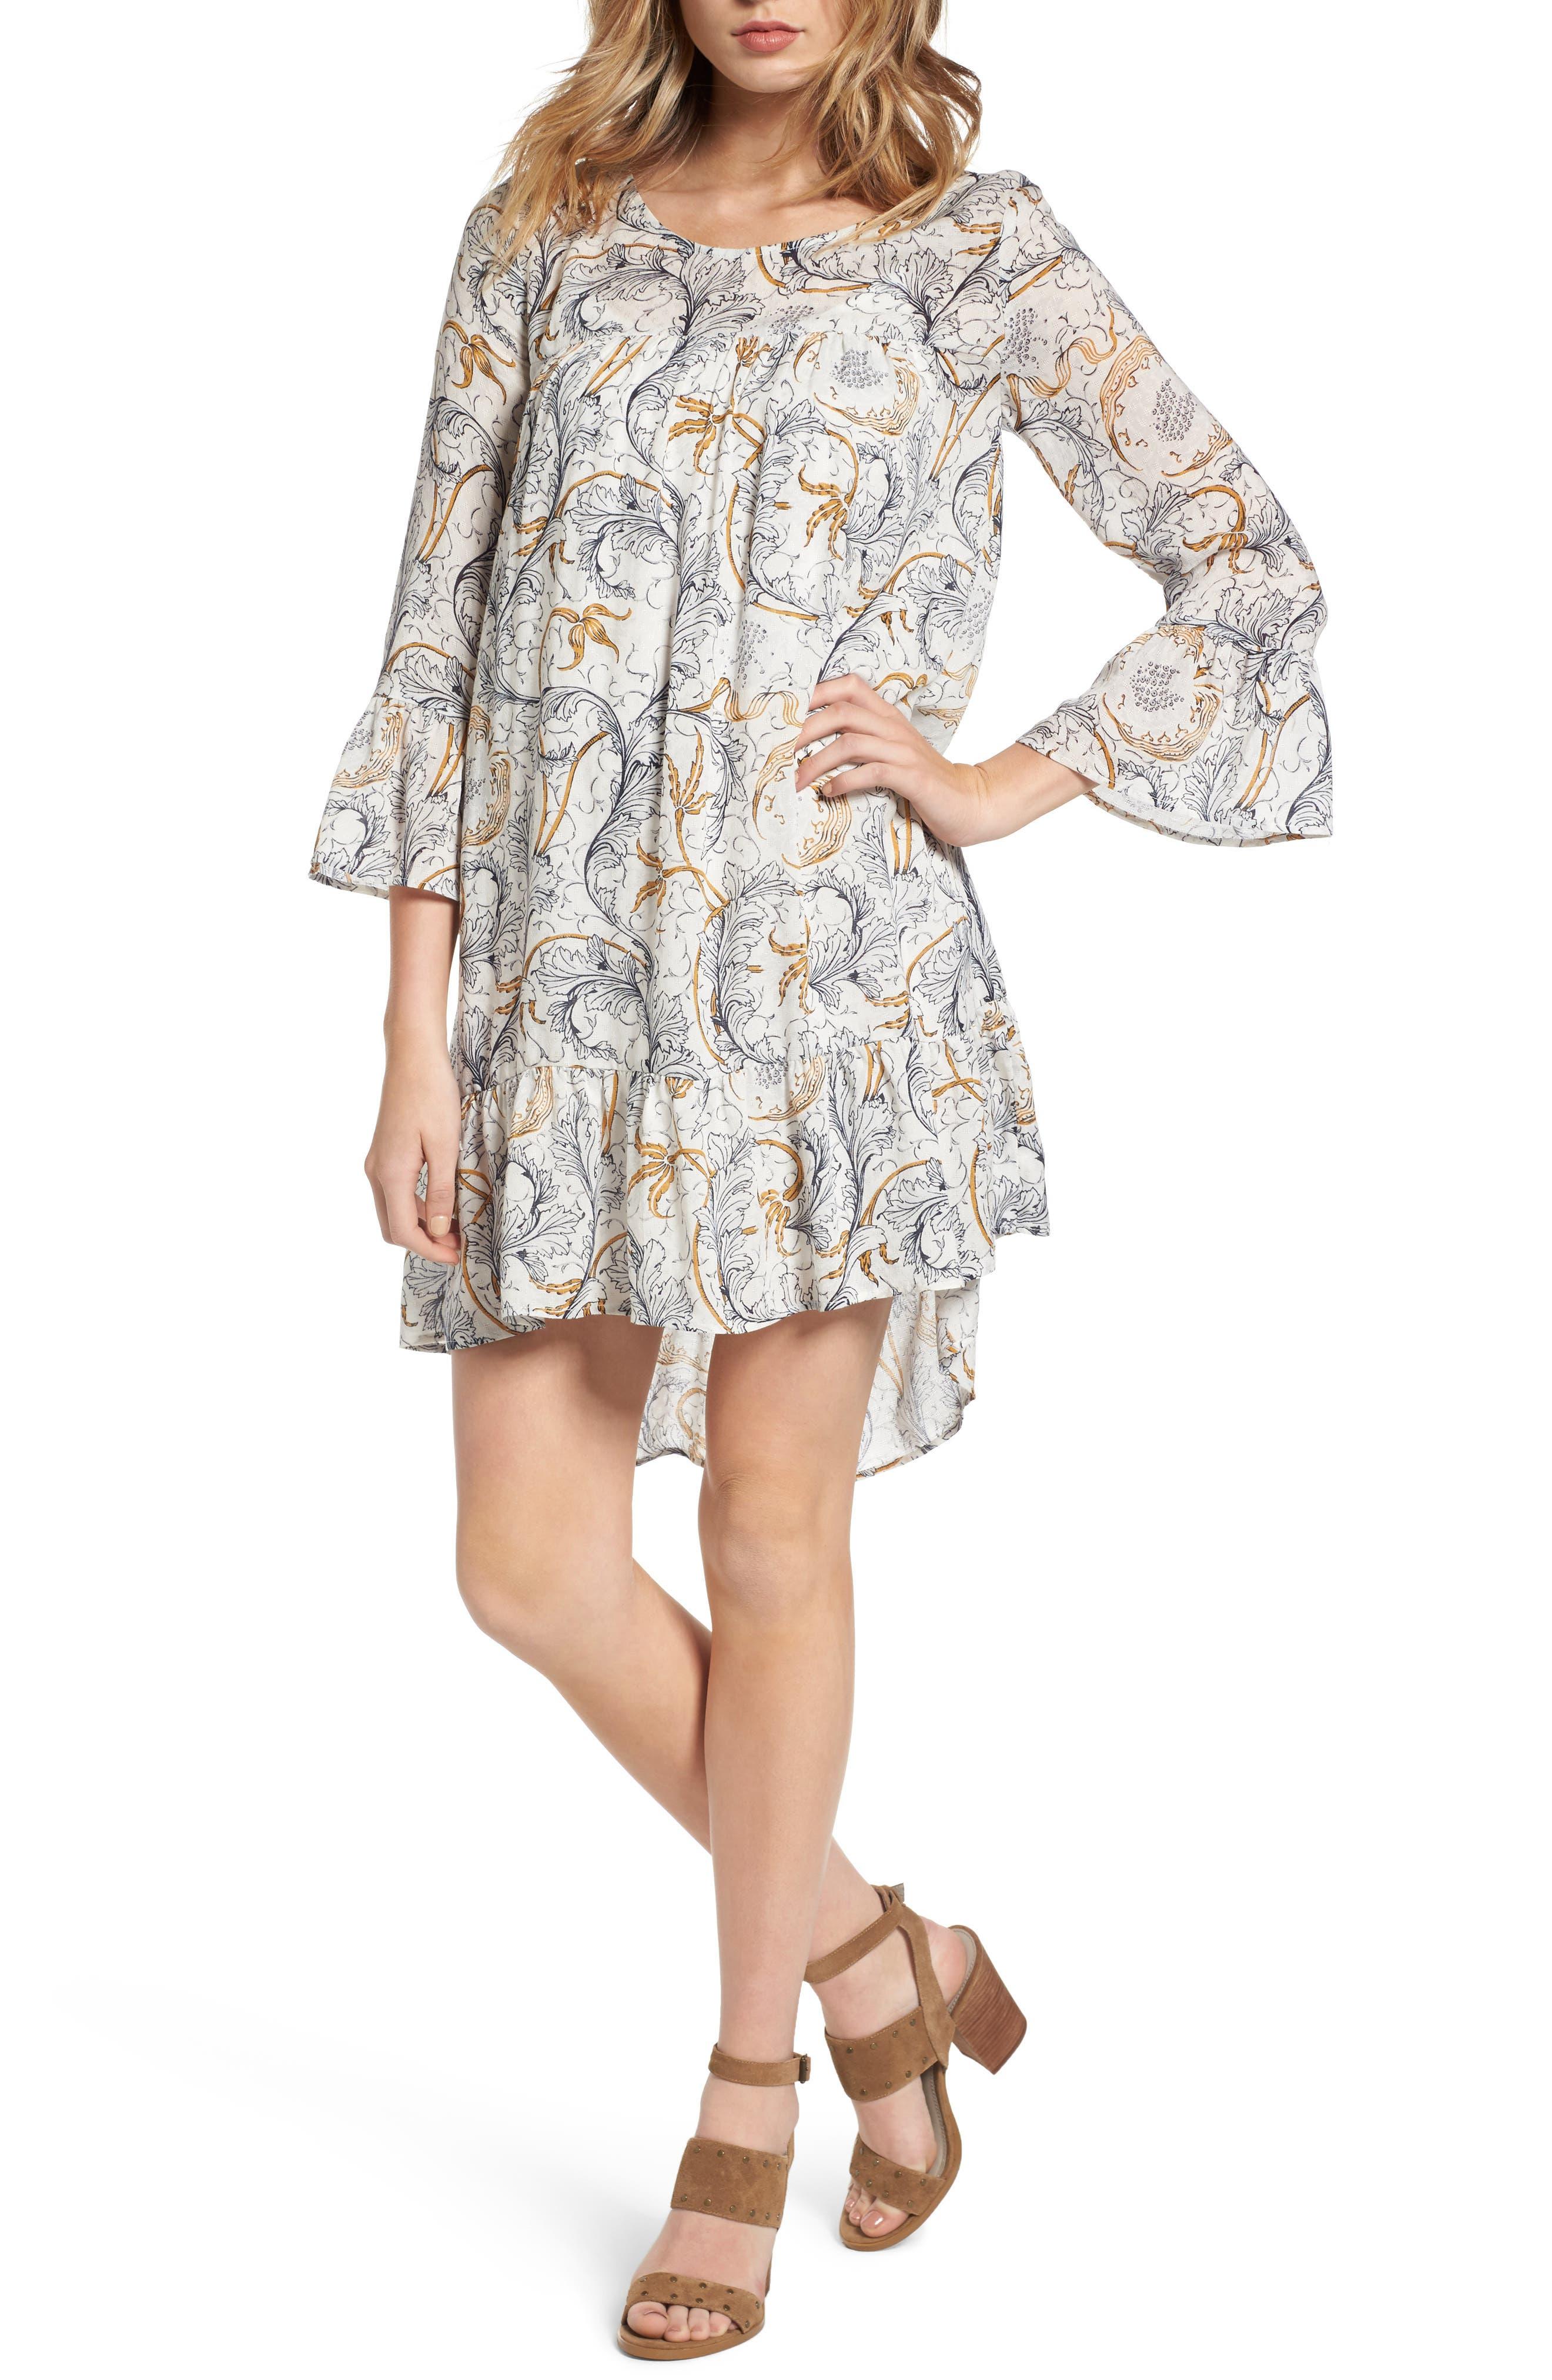 Ruffle Print Dress,                             Main thumbnail 1, color,                             Grey Fog Feathered Floral